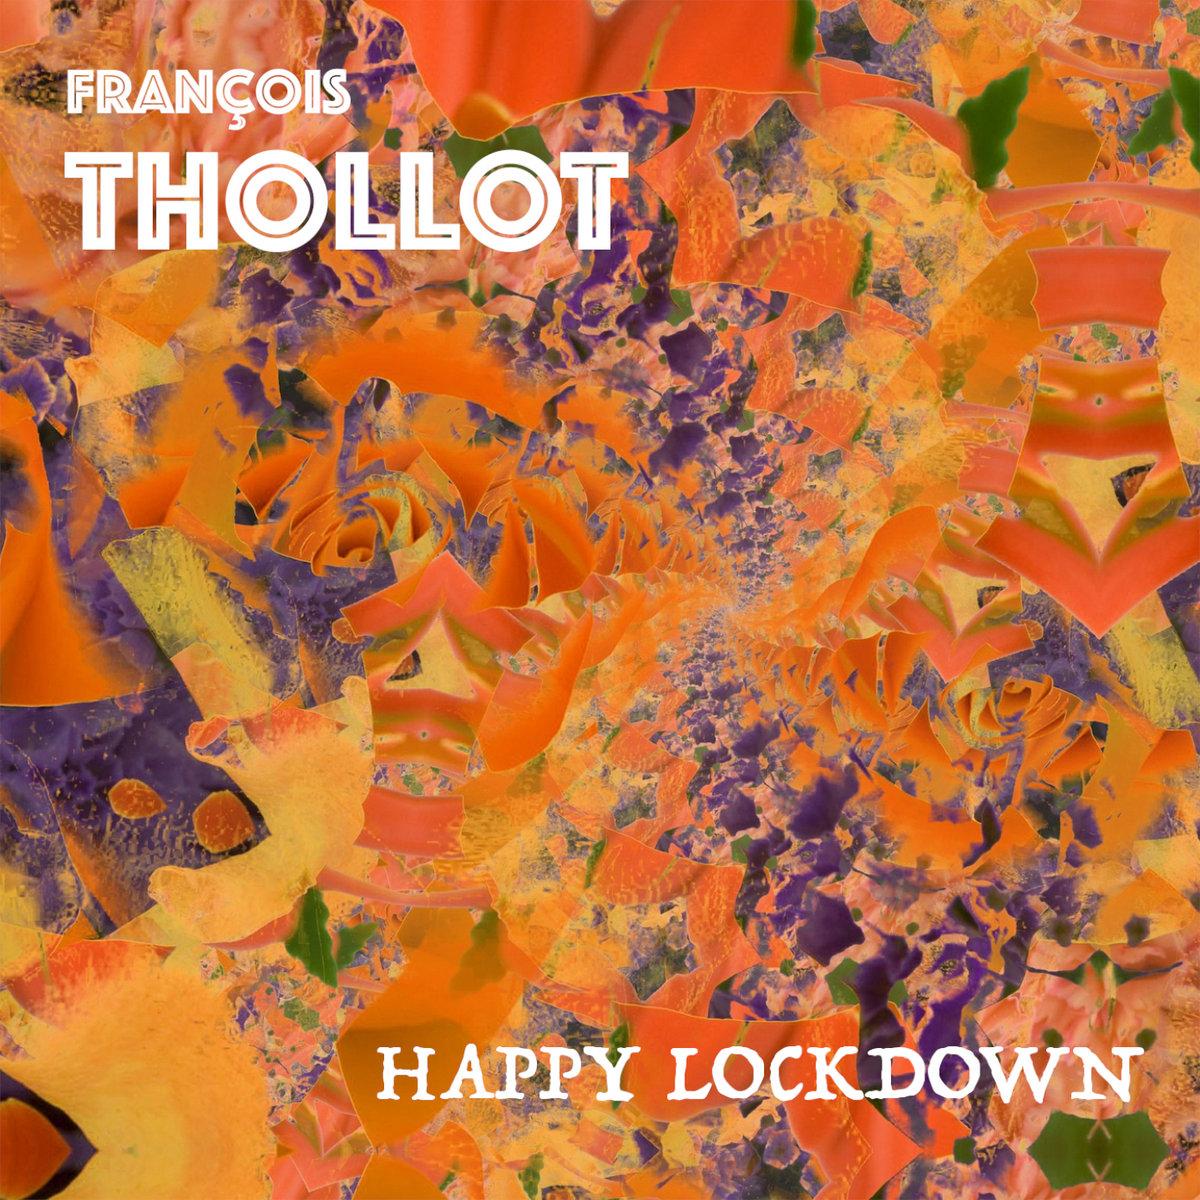 François Thollot — Happy Lockdown